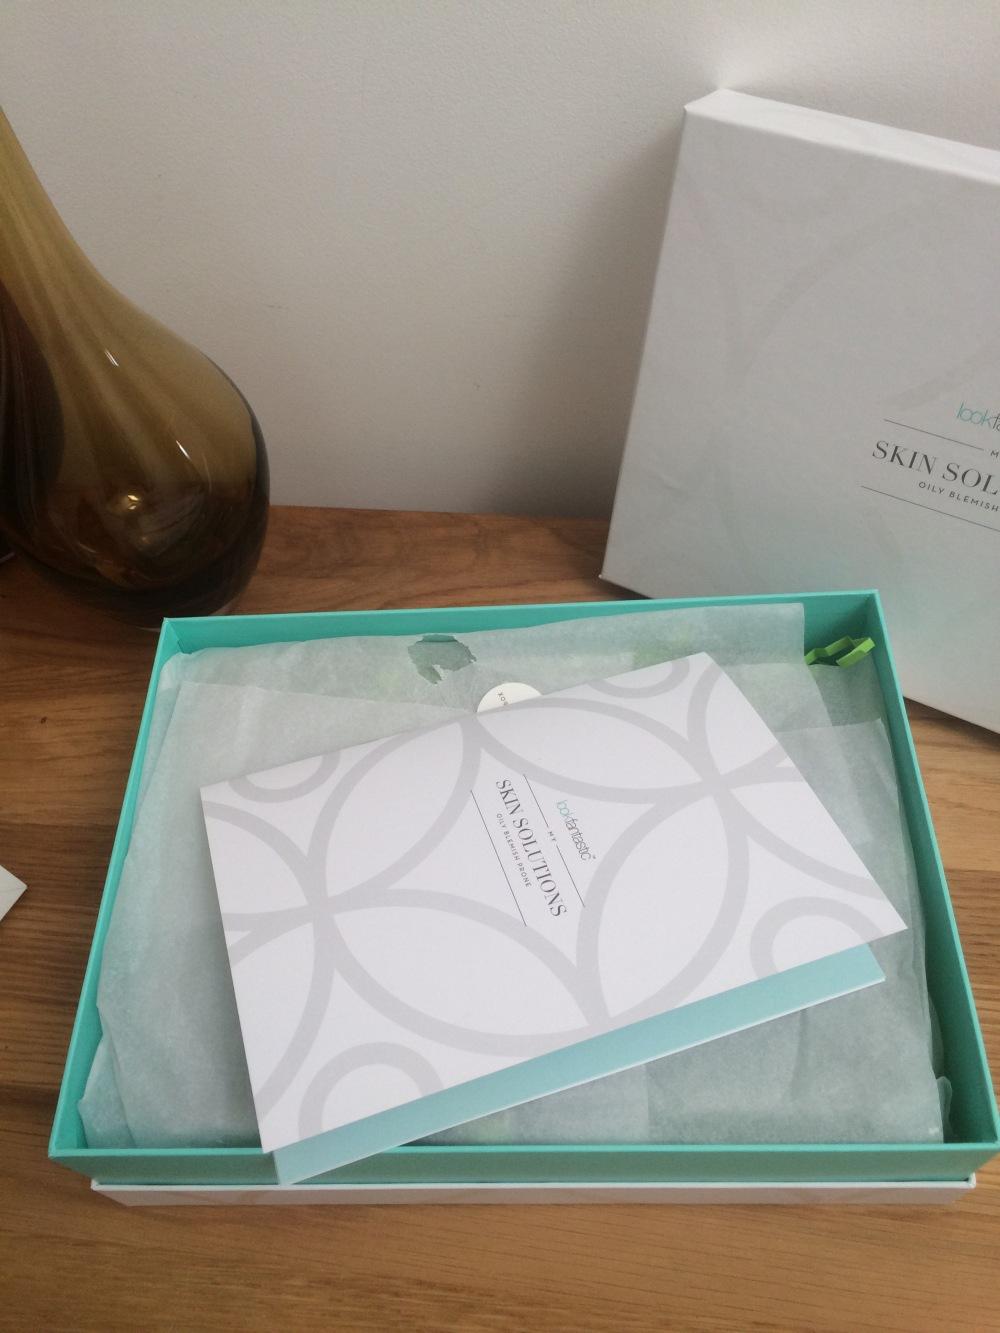 look-fantastic-my-skin-solutions-healthy-skin-box-oily-blemish-prone-skin-packaging